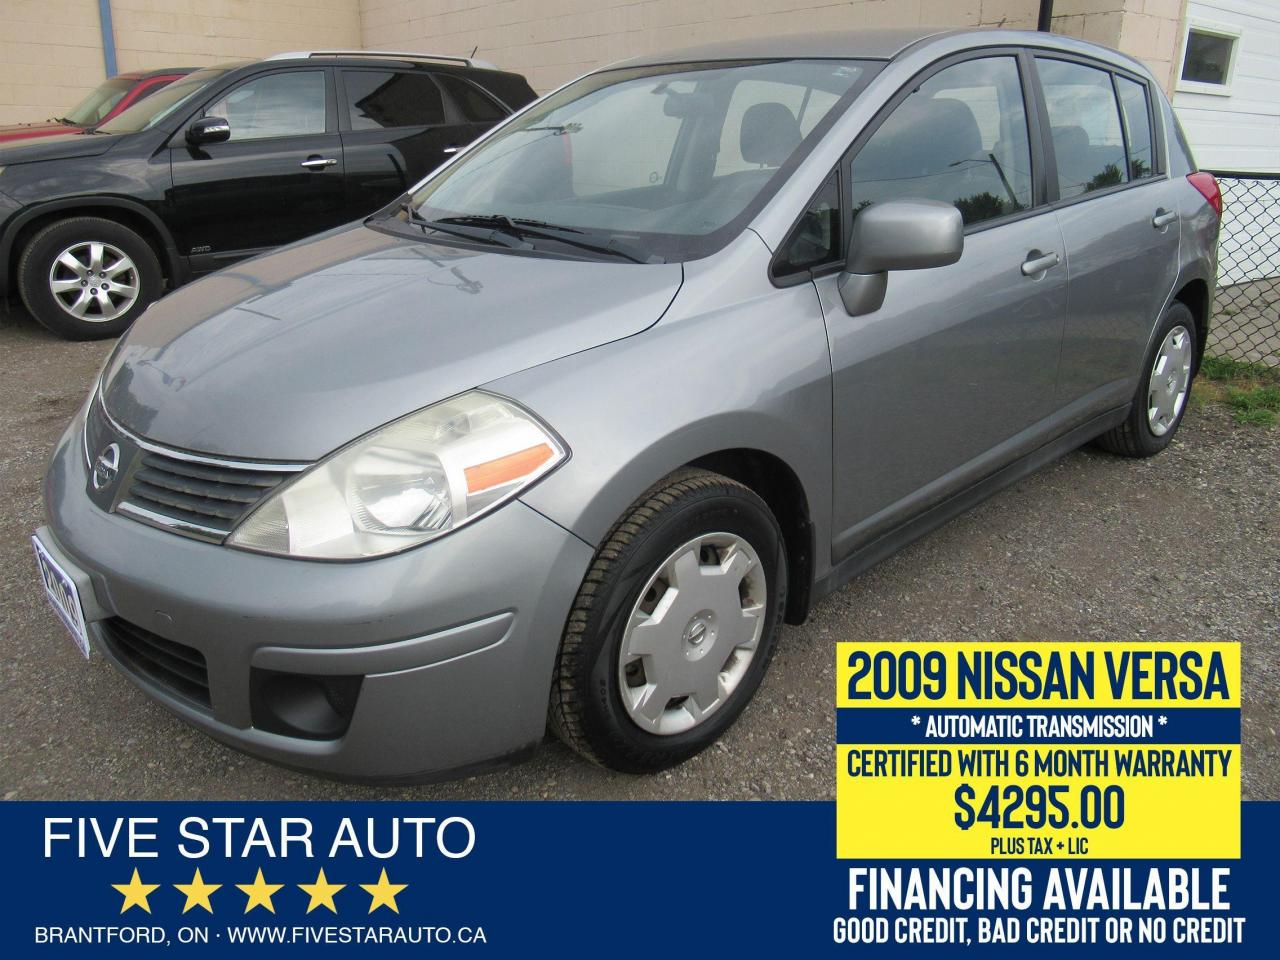 2009 Nissan Versa 1.8 S *Clean Carfax* Certified w/ 6 Month Warranty